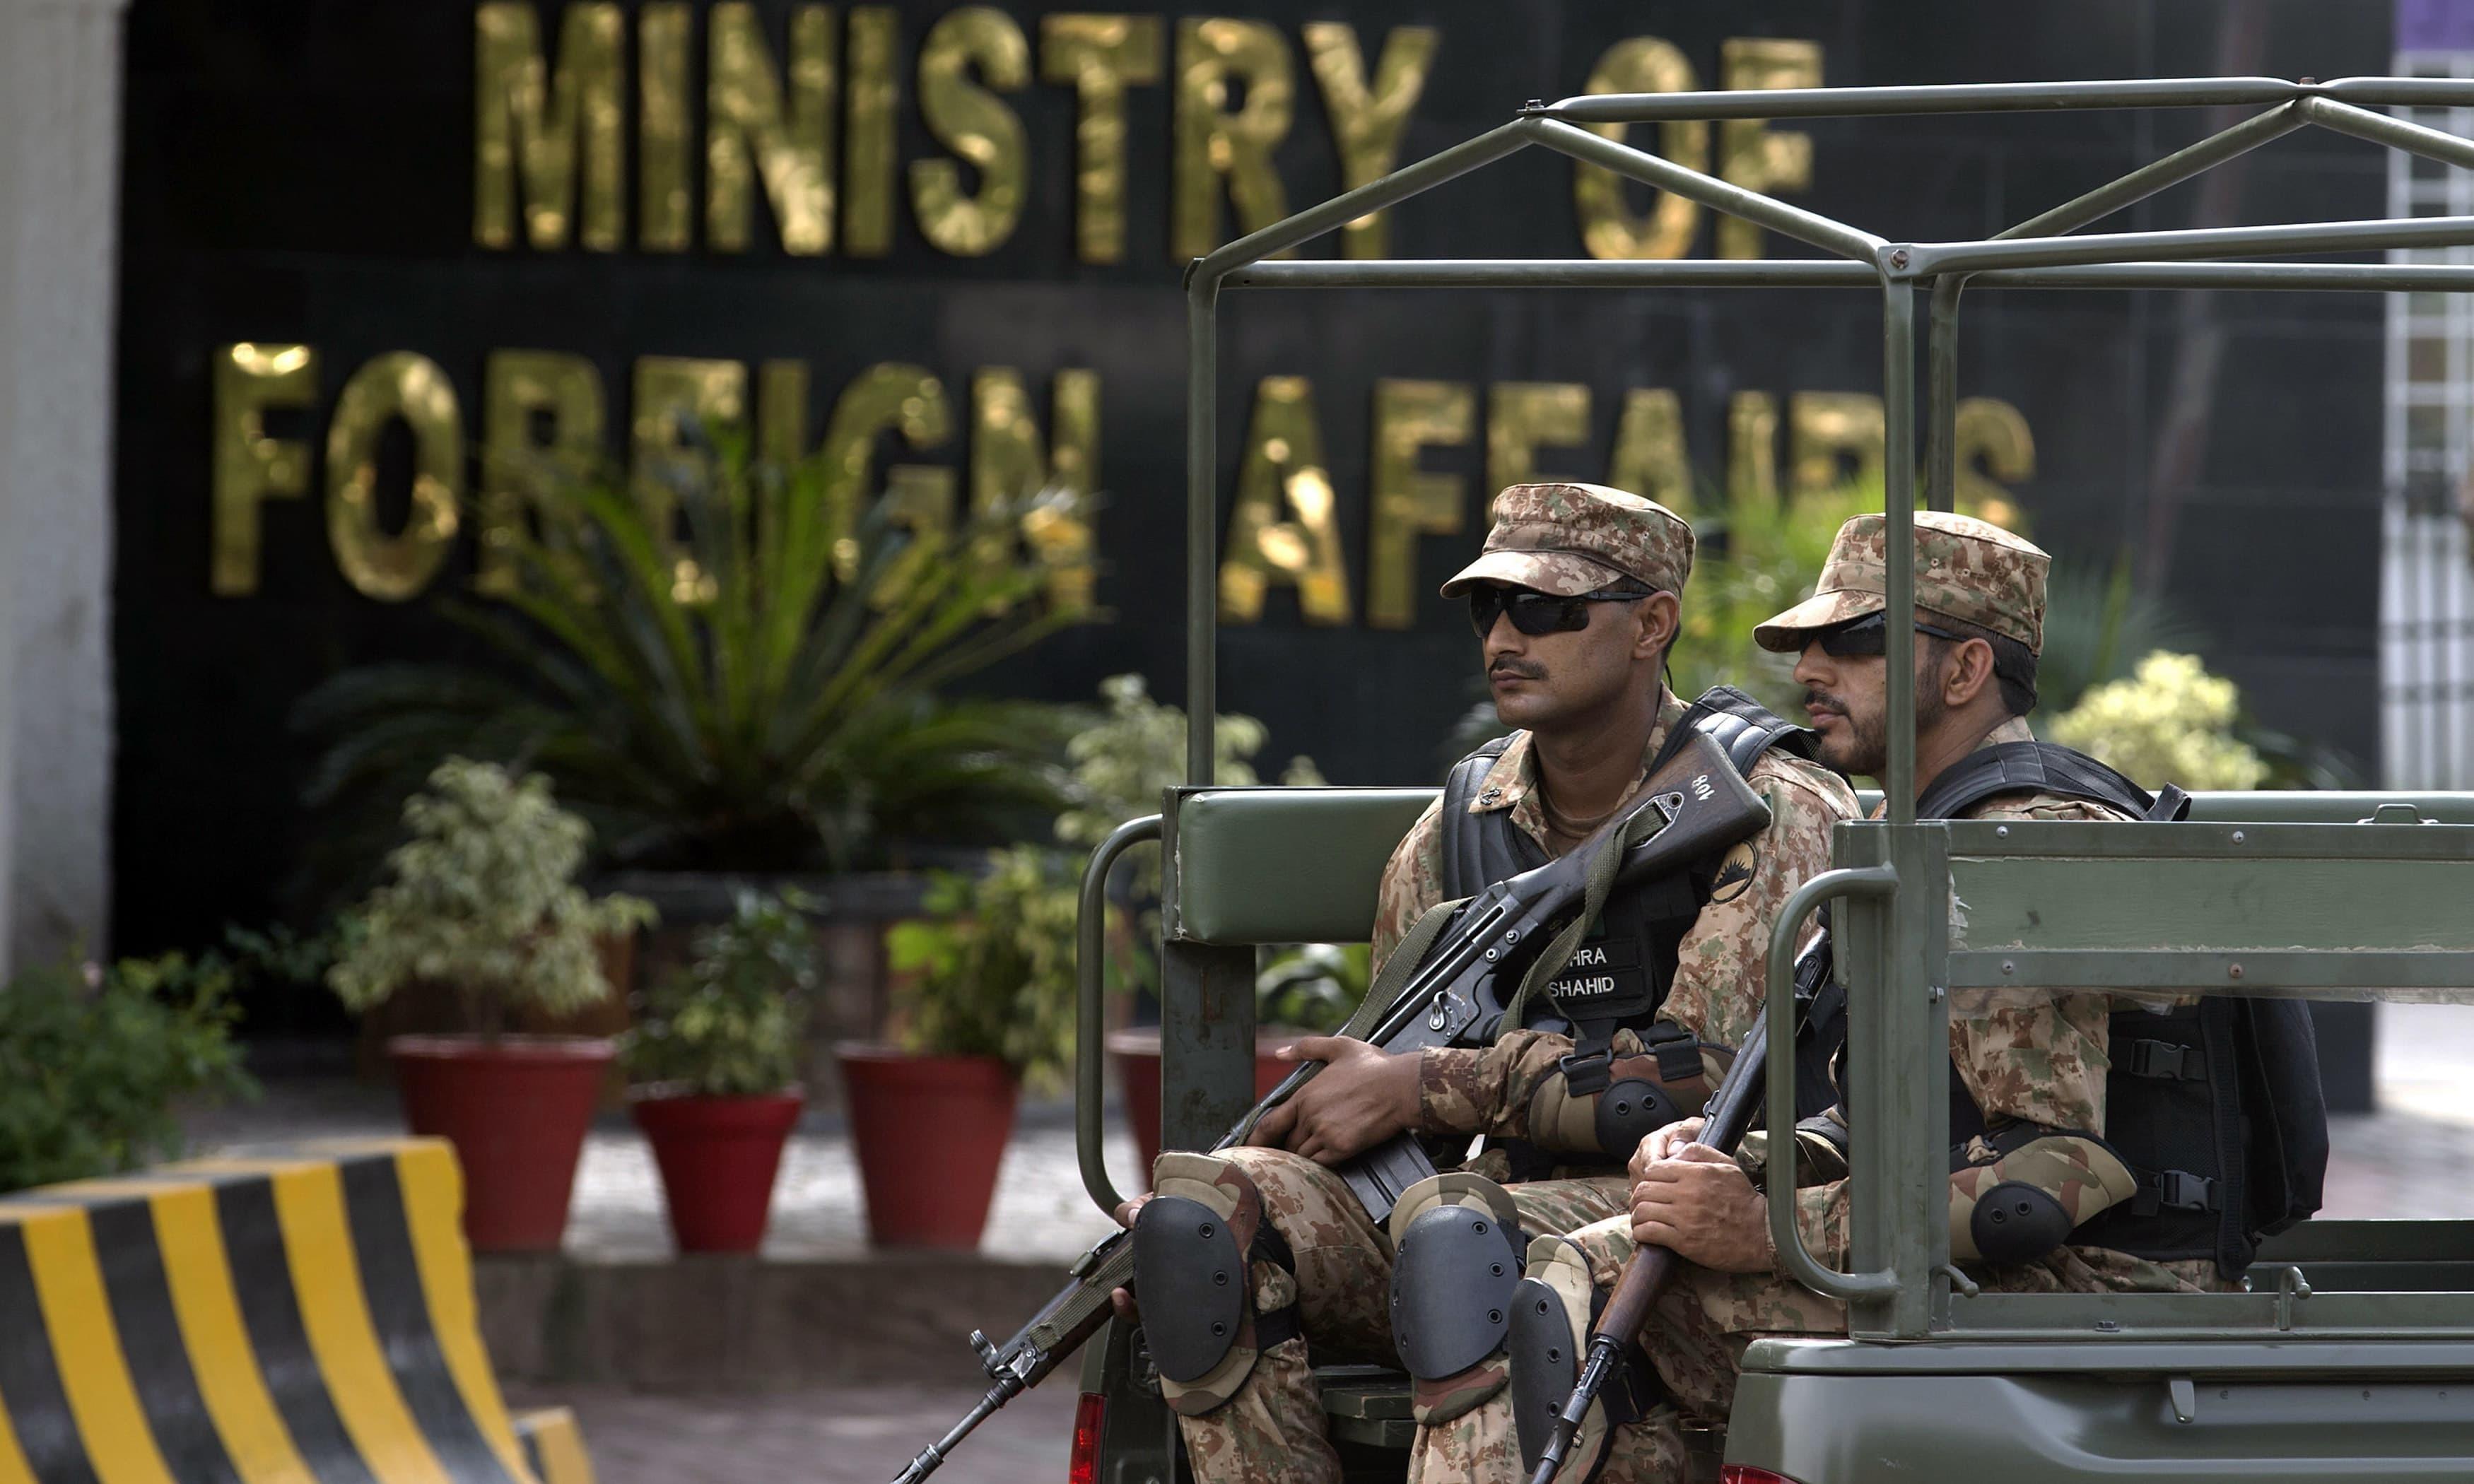 ایل او سی پر جنگ بندی کی خلاف ورزی، بھارتی سفارتکار دفتر خارجہ طلب